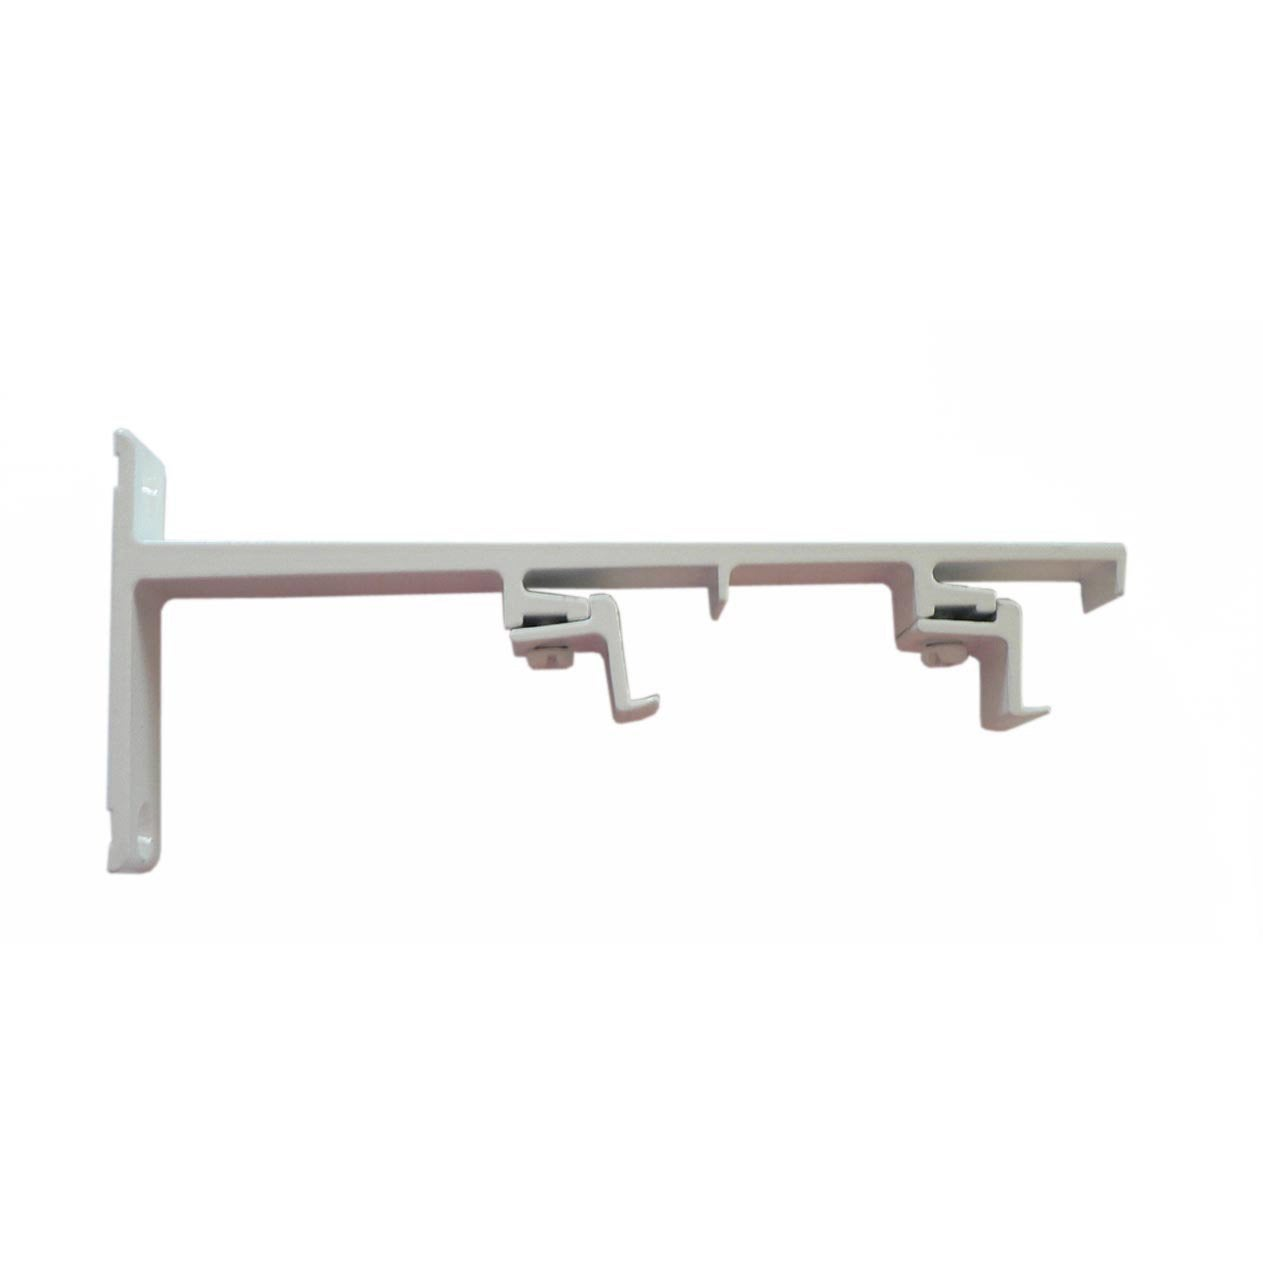 Support simple mur en acier blanc classic rail cm leroy merlin - Support plantes grimpantes leroy merlin ...